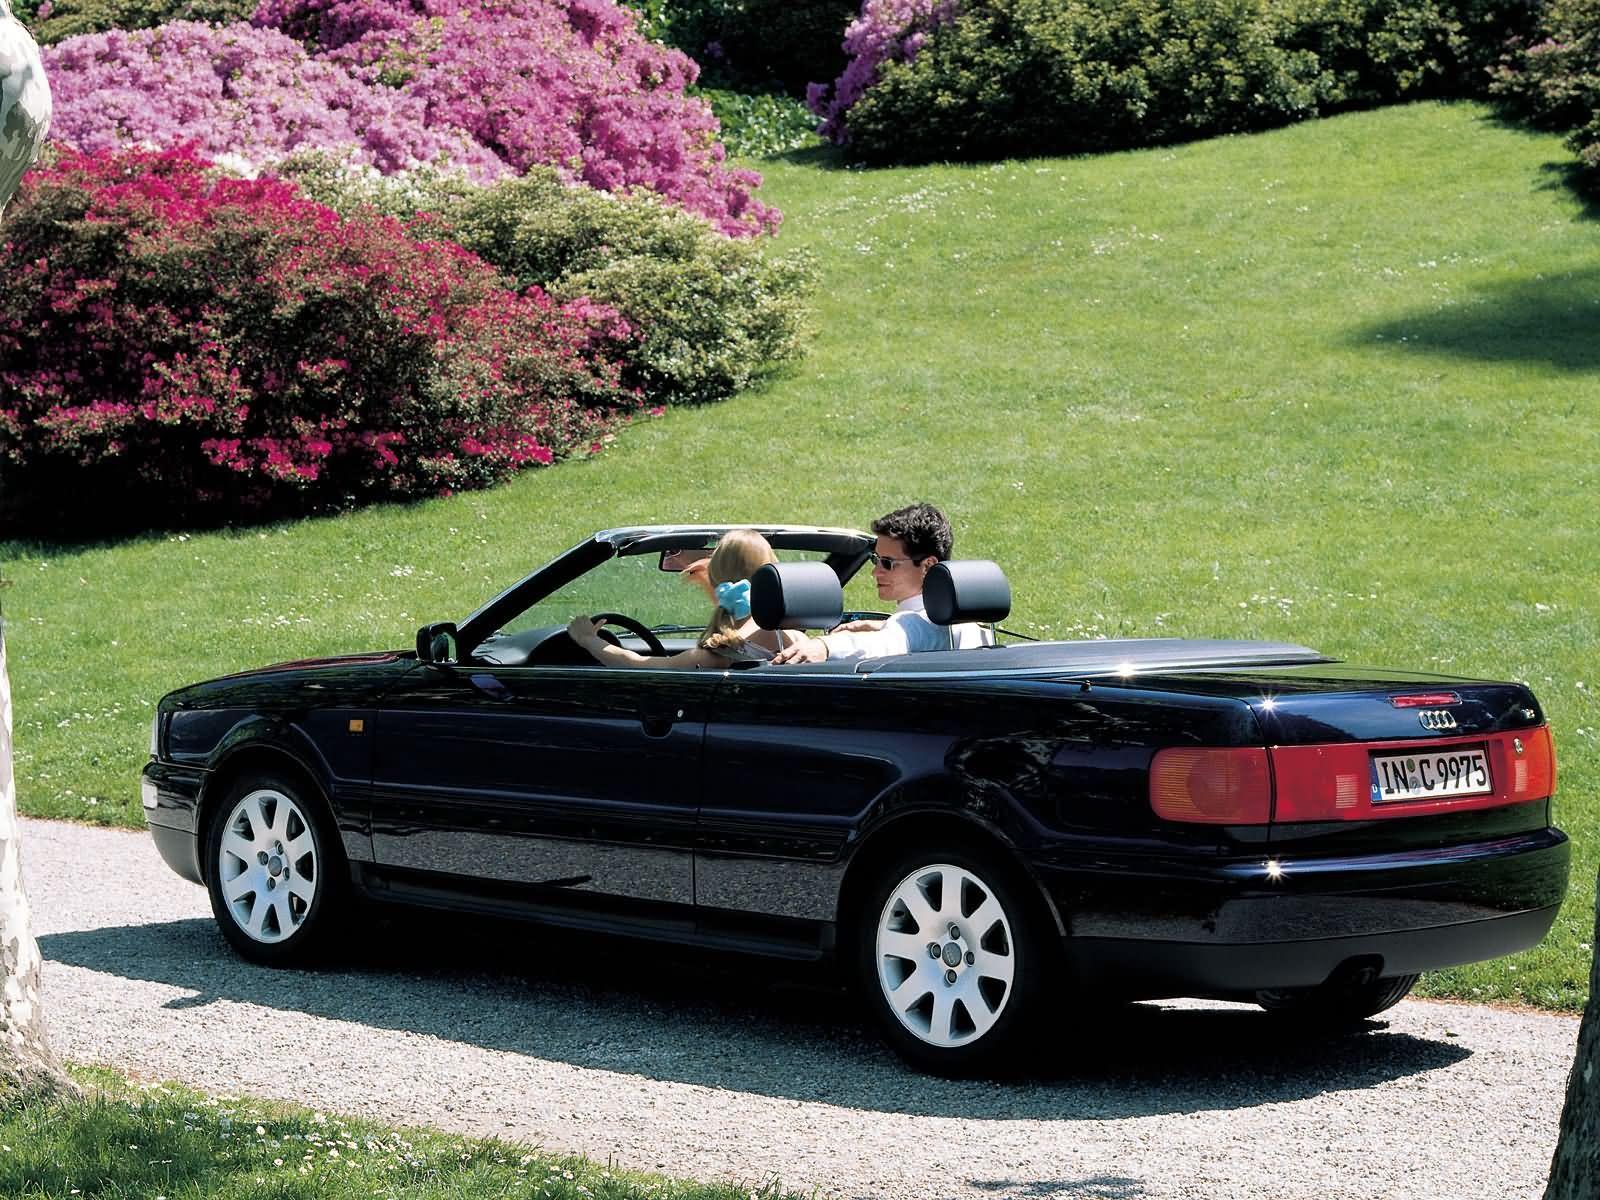 tdi audi used s maxresdefault car line sale dealer for watch auto lichfield quattro convertible